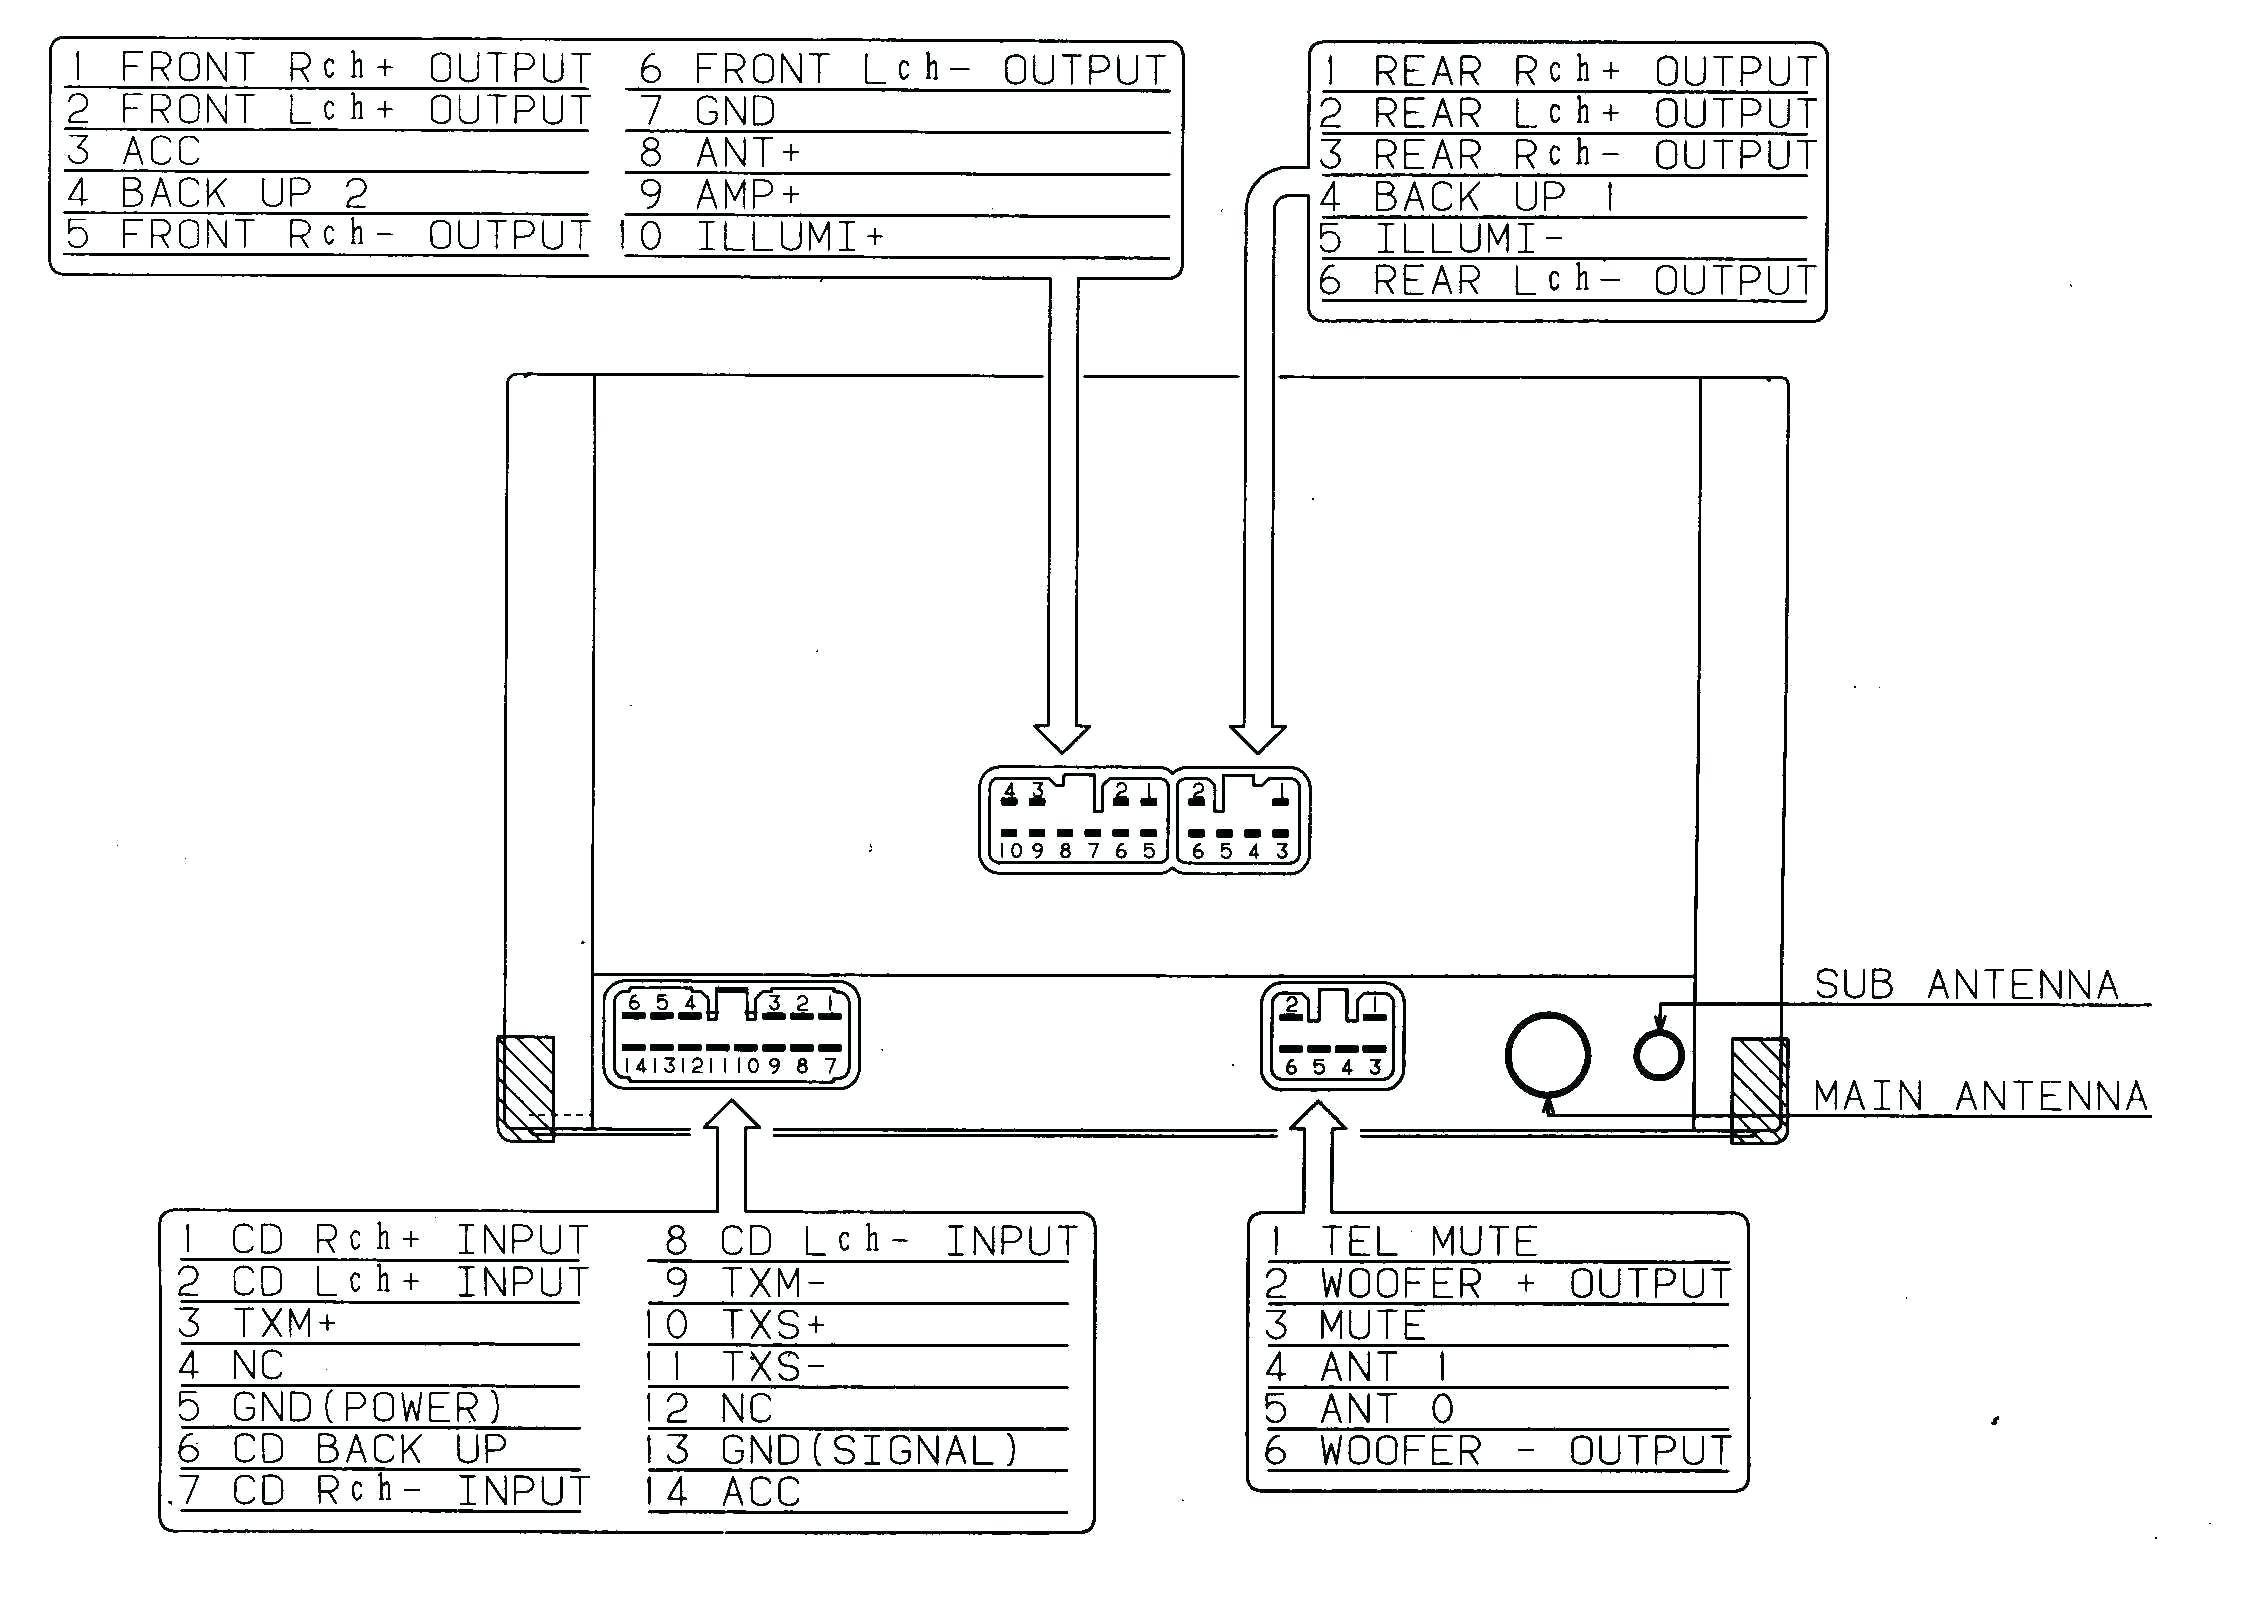 avh p5700dvd wiringnew pioneer avh p5700dvd wiring diagram wiring diagram  image pioneer avh p5200bt wiring diagram